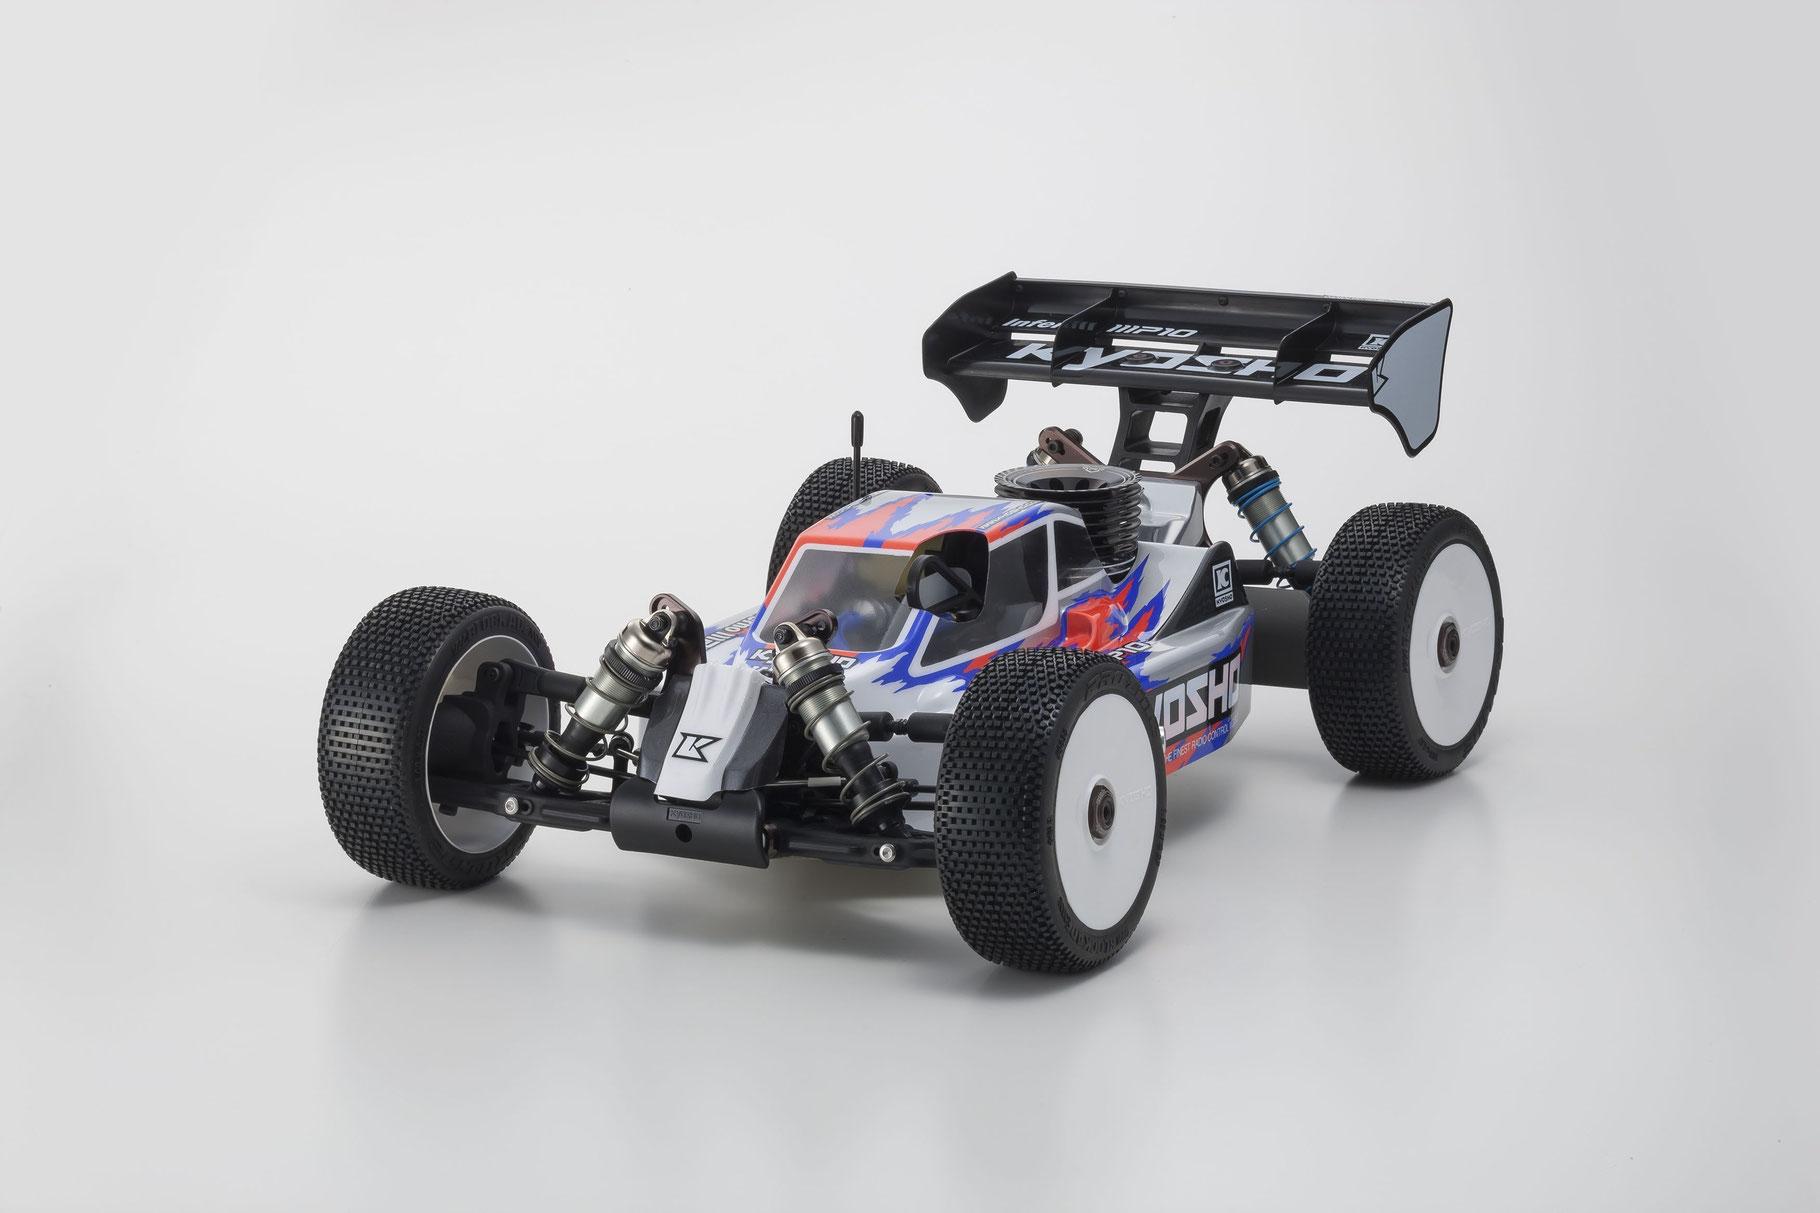 Kabel 100/% ok 6216m2 LEGO® Technic 4,5V Motor mit Batteriekasten Schalter u